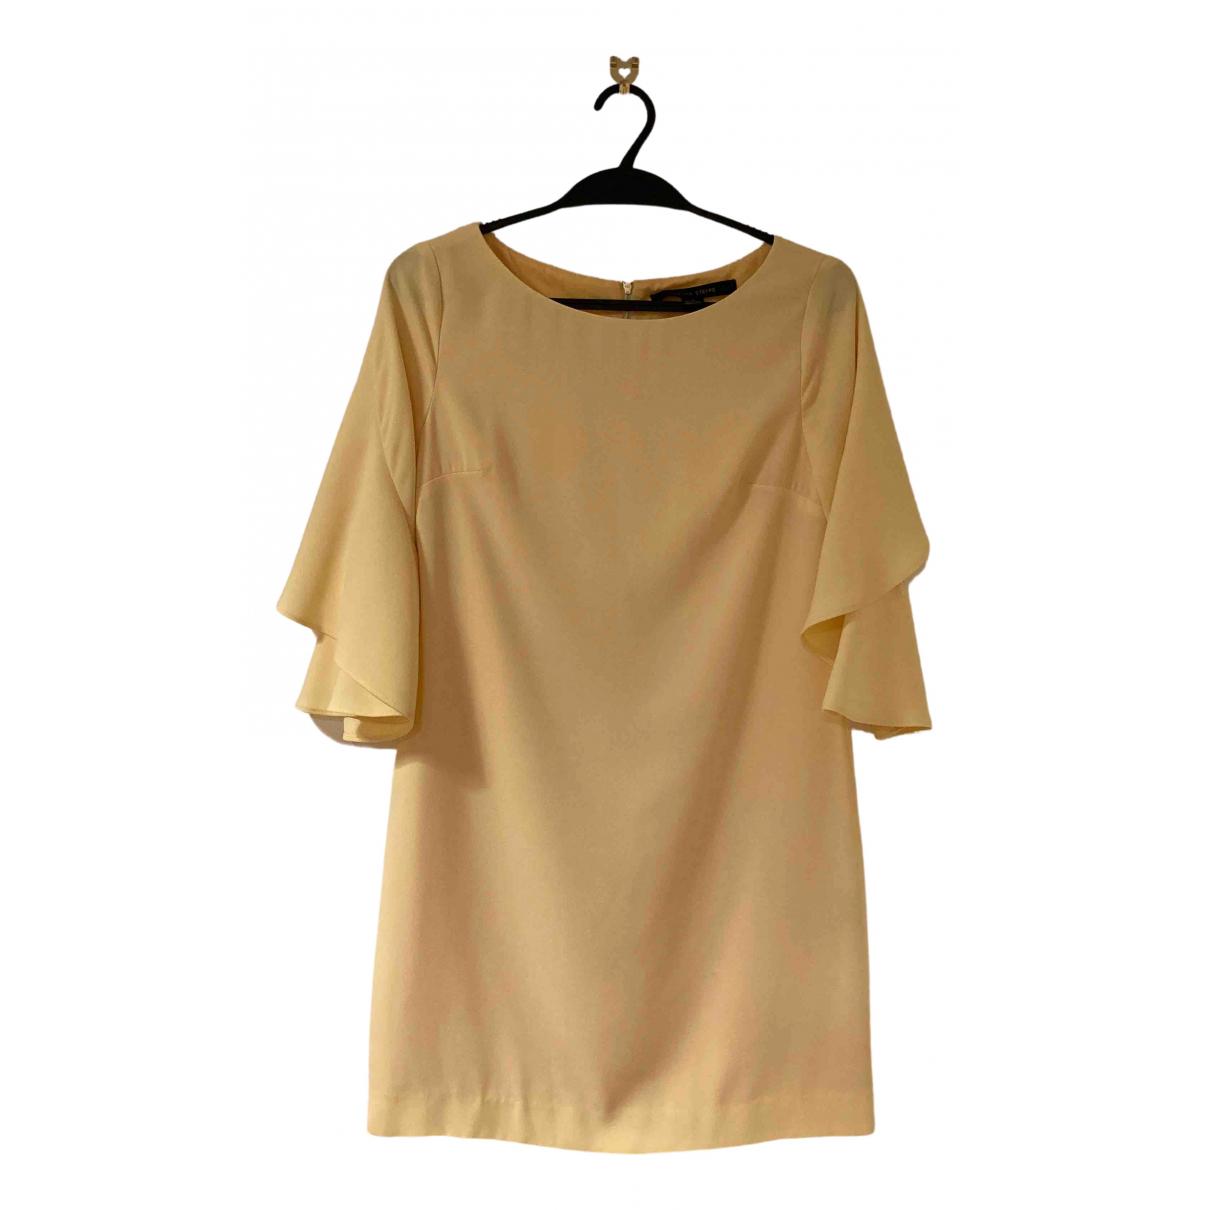 Cynthia Steffe \N Kleid in  Gelb Polyester